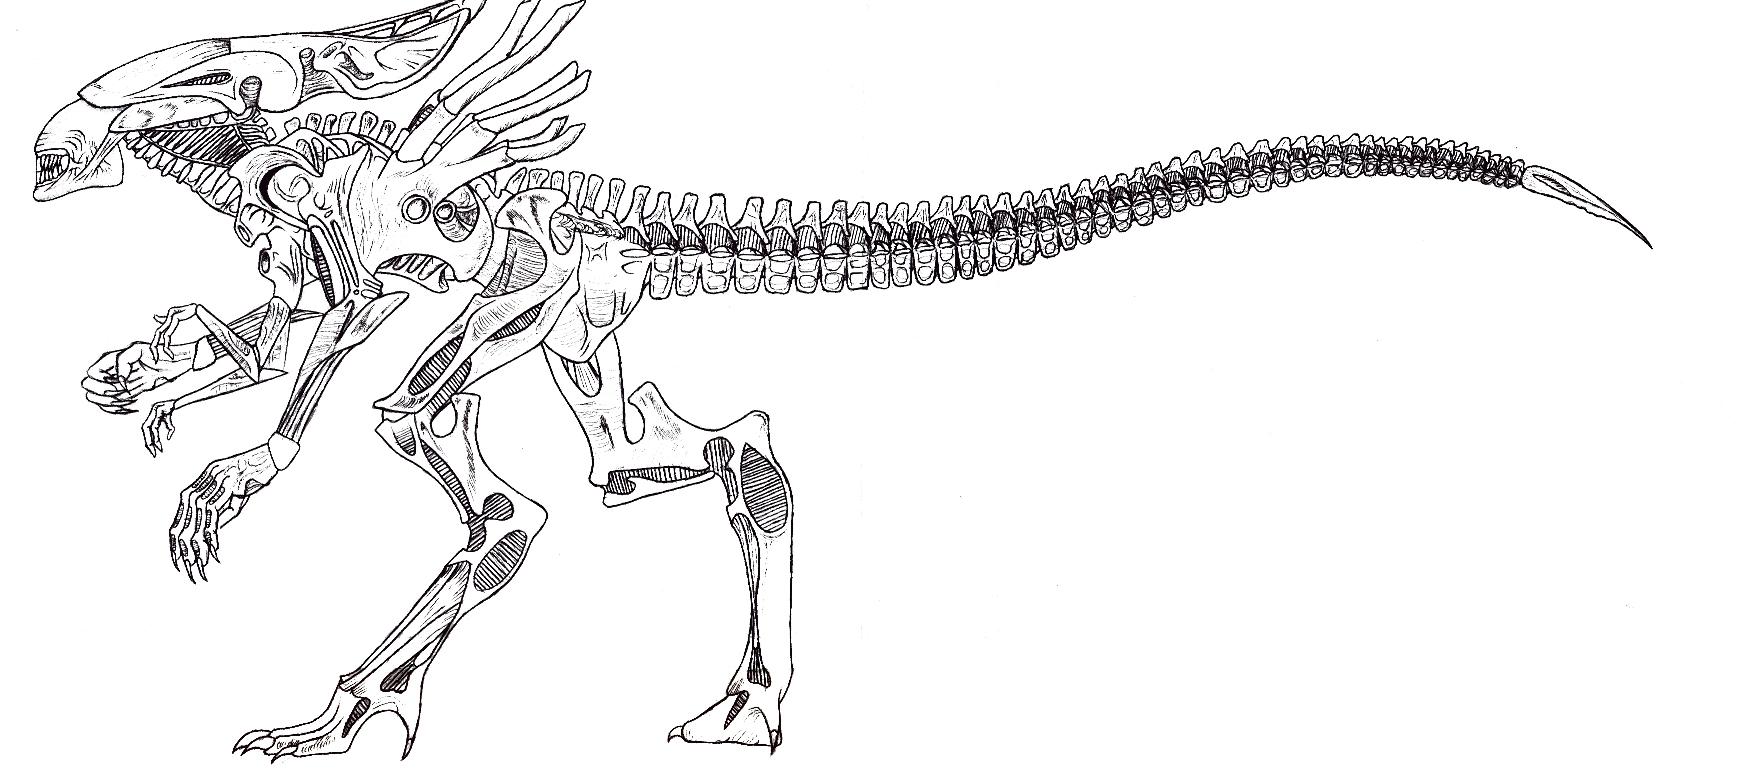 FULL LENGTH Queen Alien by PsychoEvolution on DeviantArt